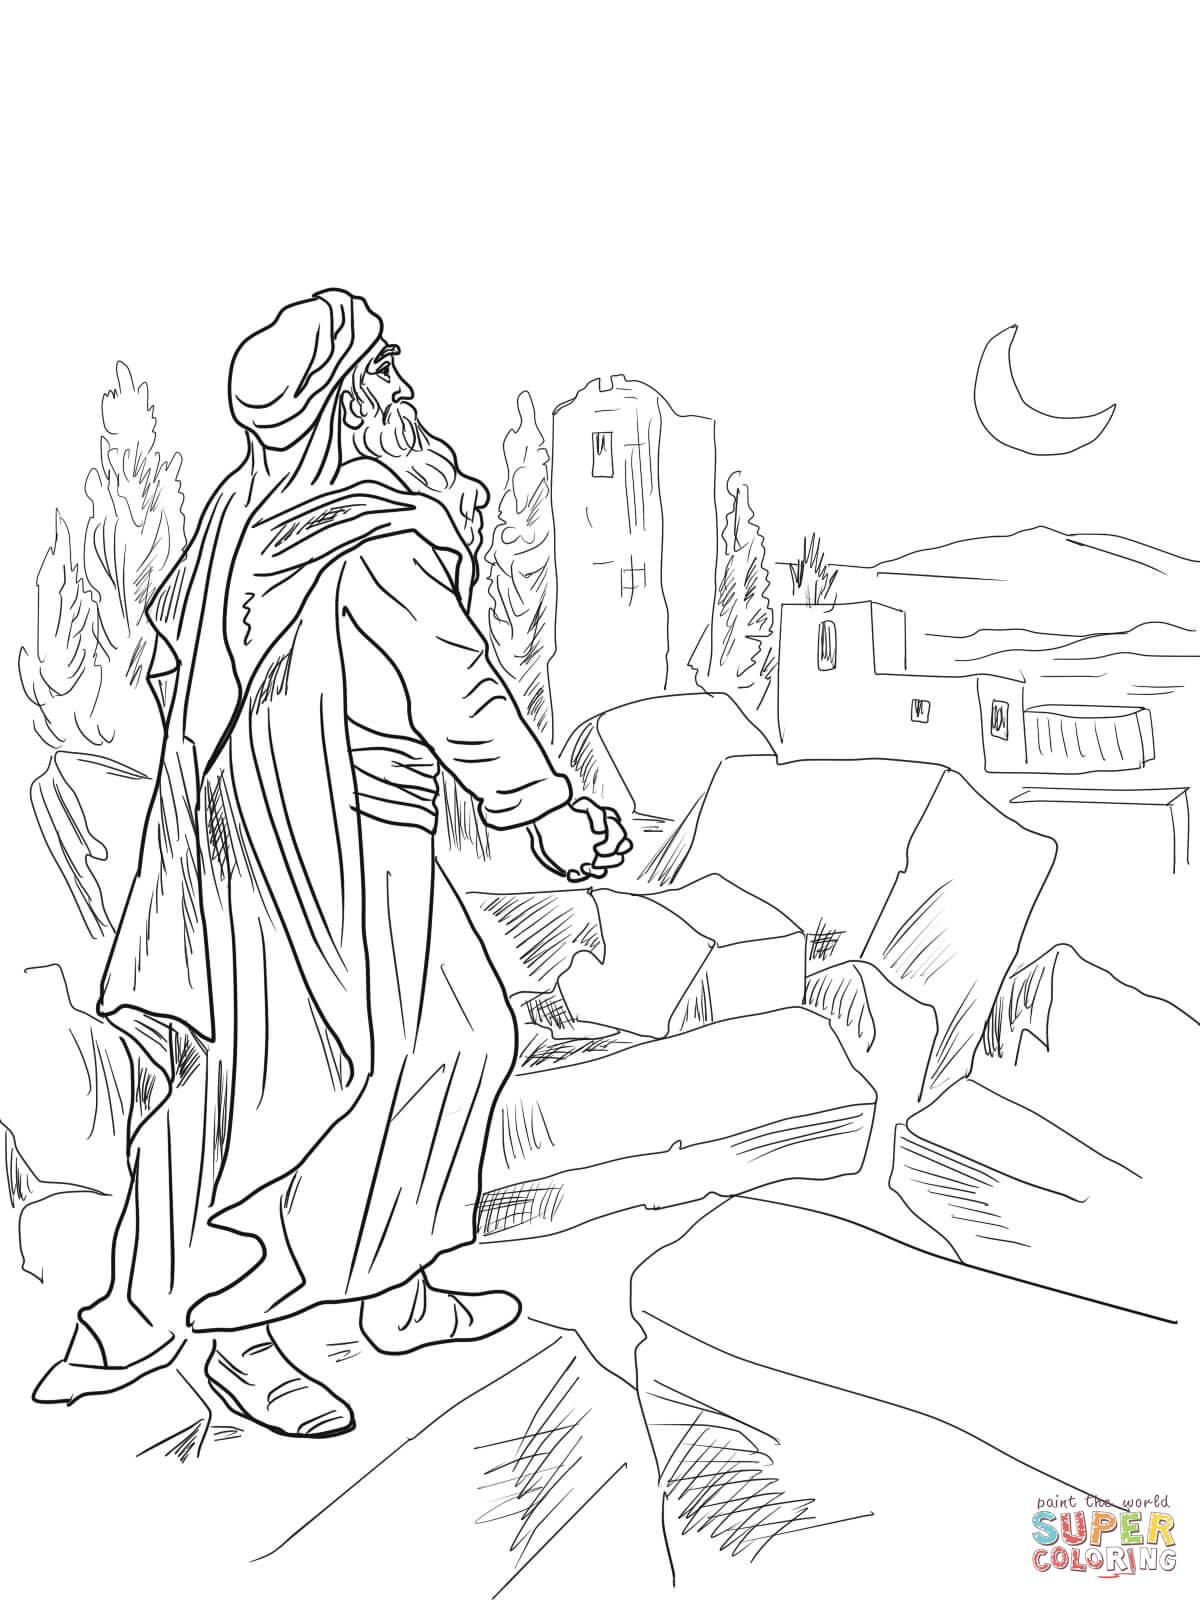 Nehemiah Observing Broken Walls Of Jerusalem Coloring Page